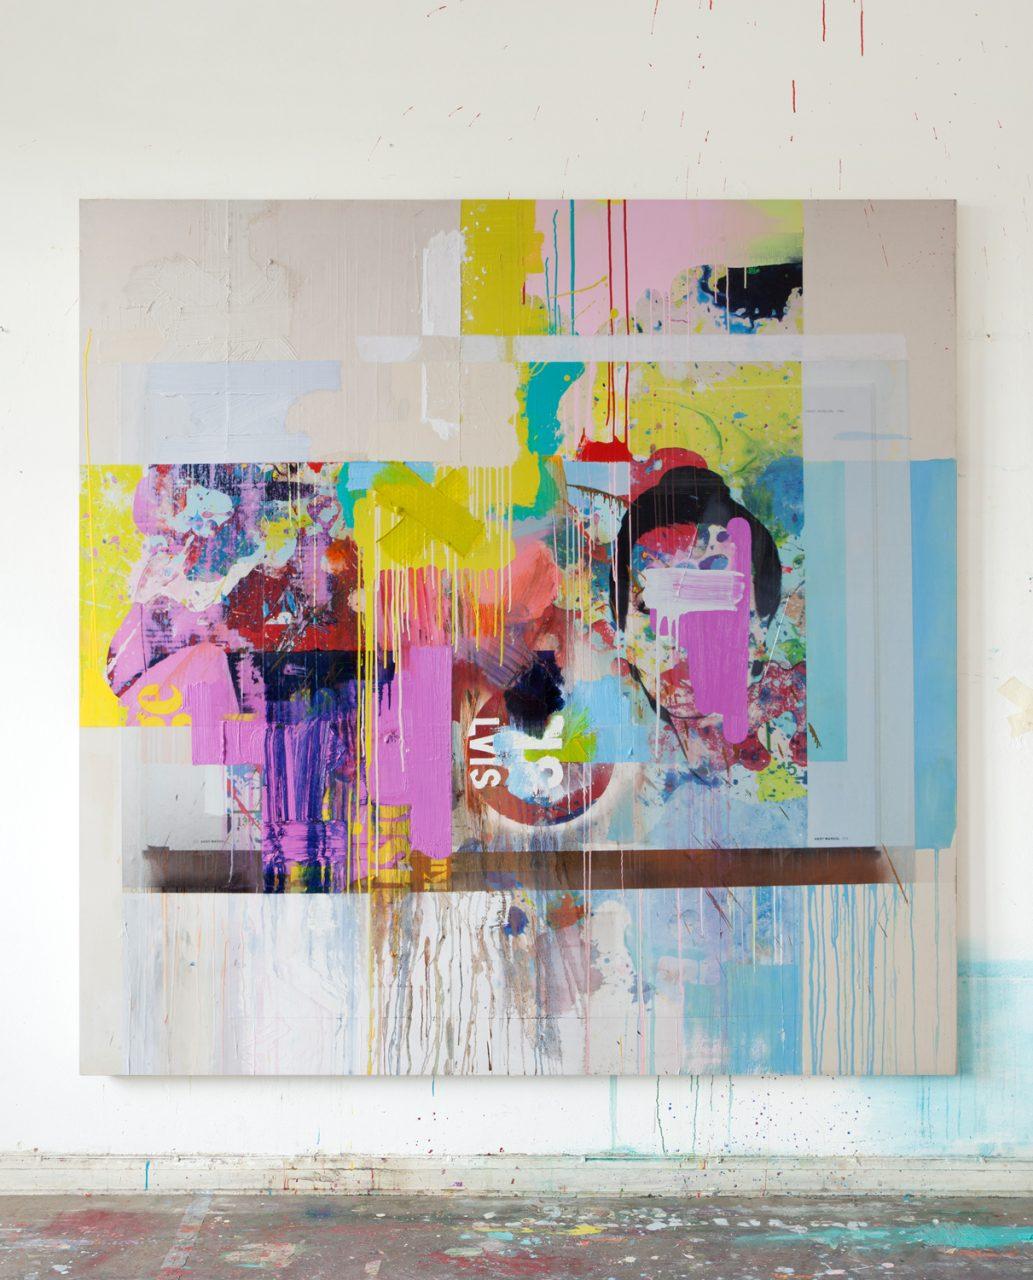 Painting 200 x 200 cm